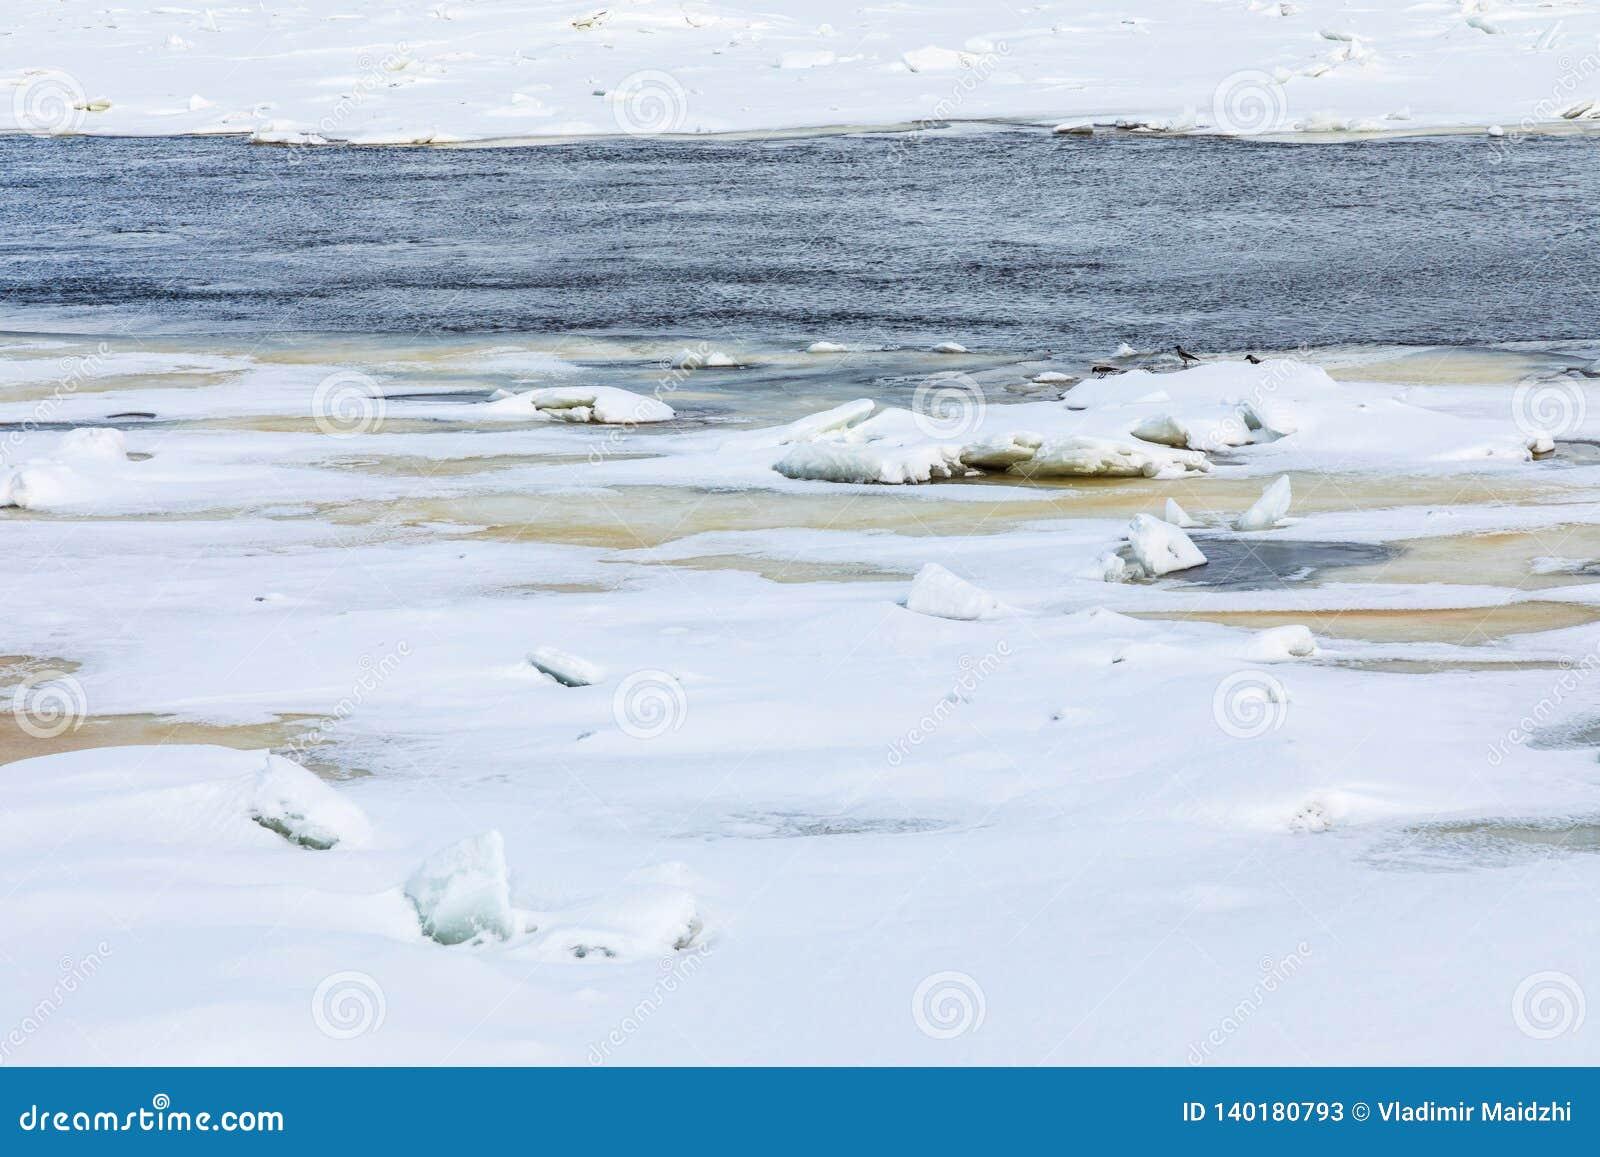 Mindre kulle och isflaken på vinterfloden